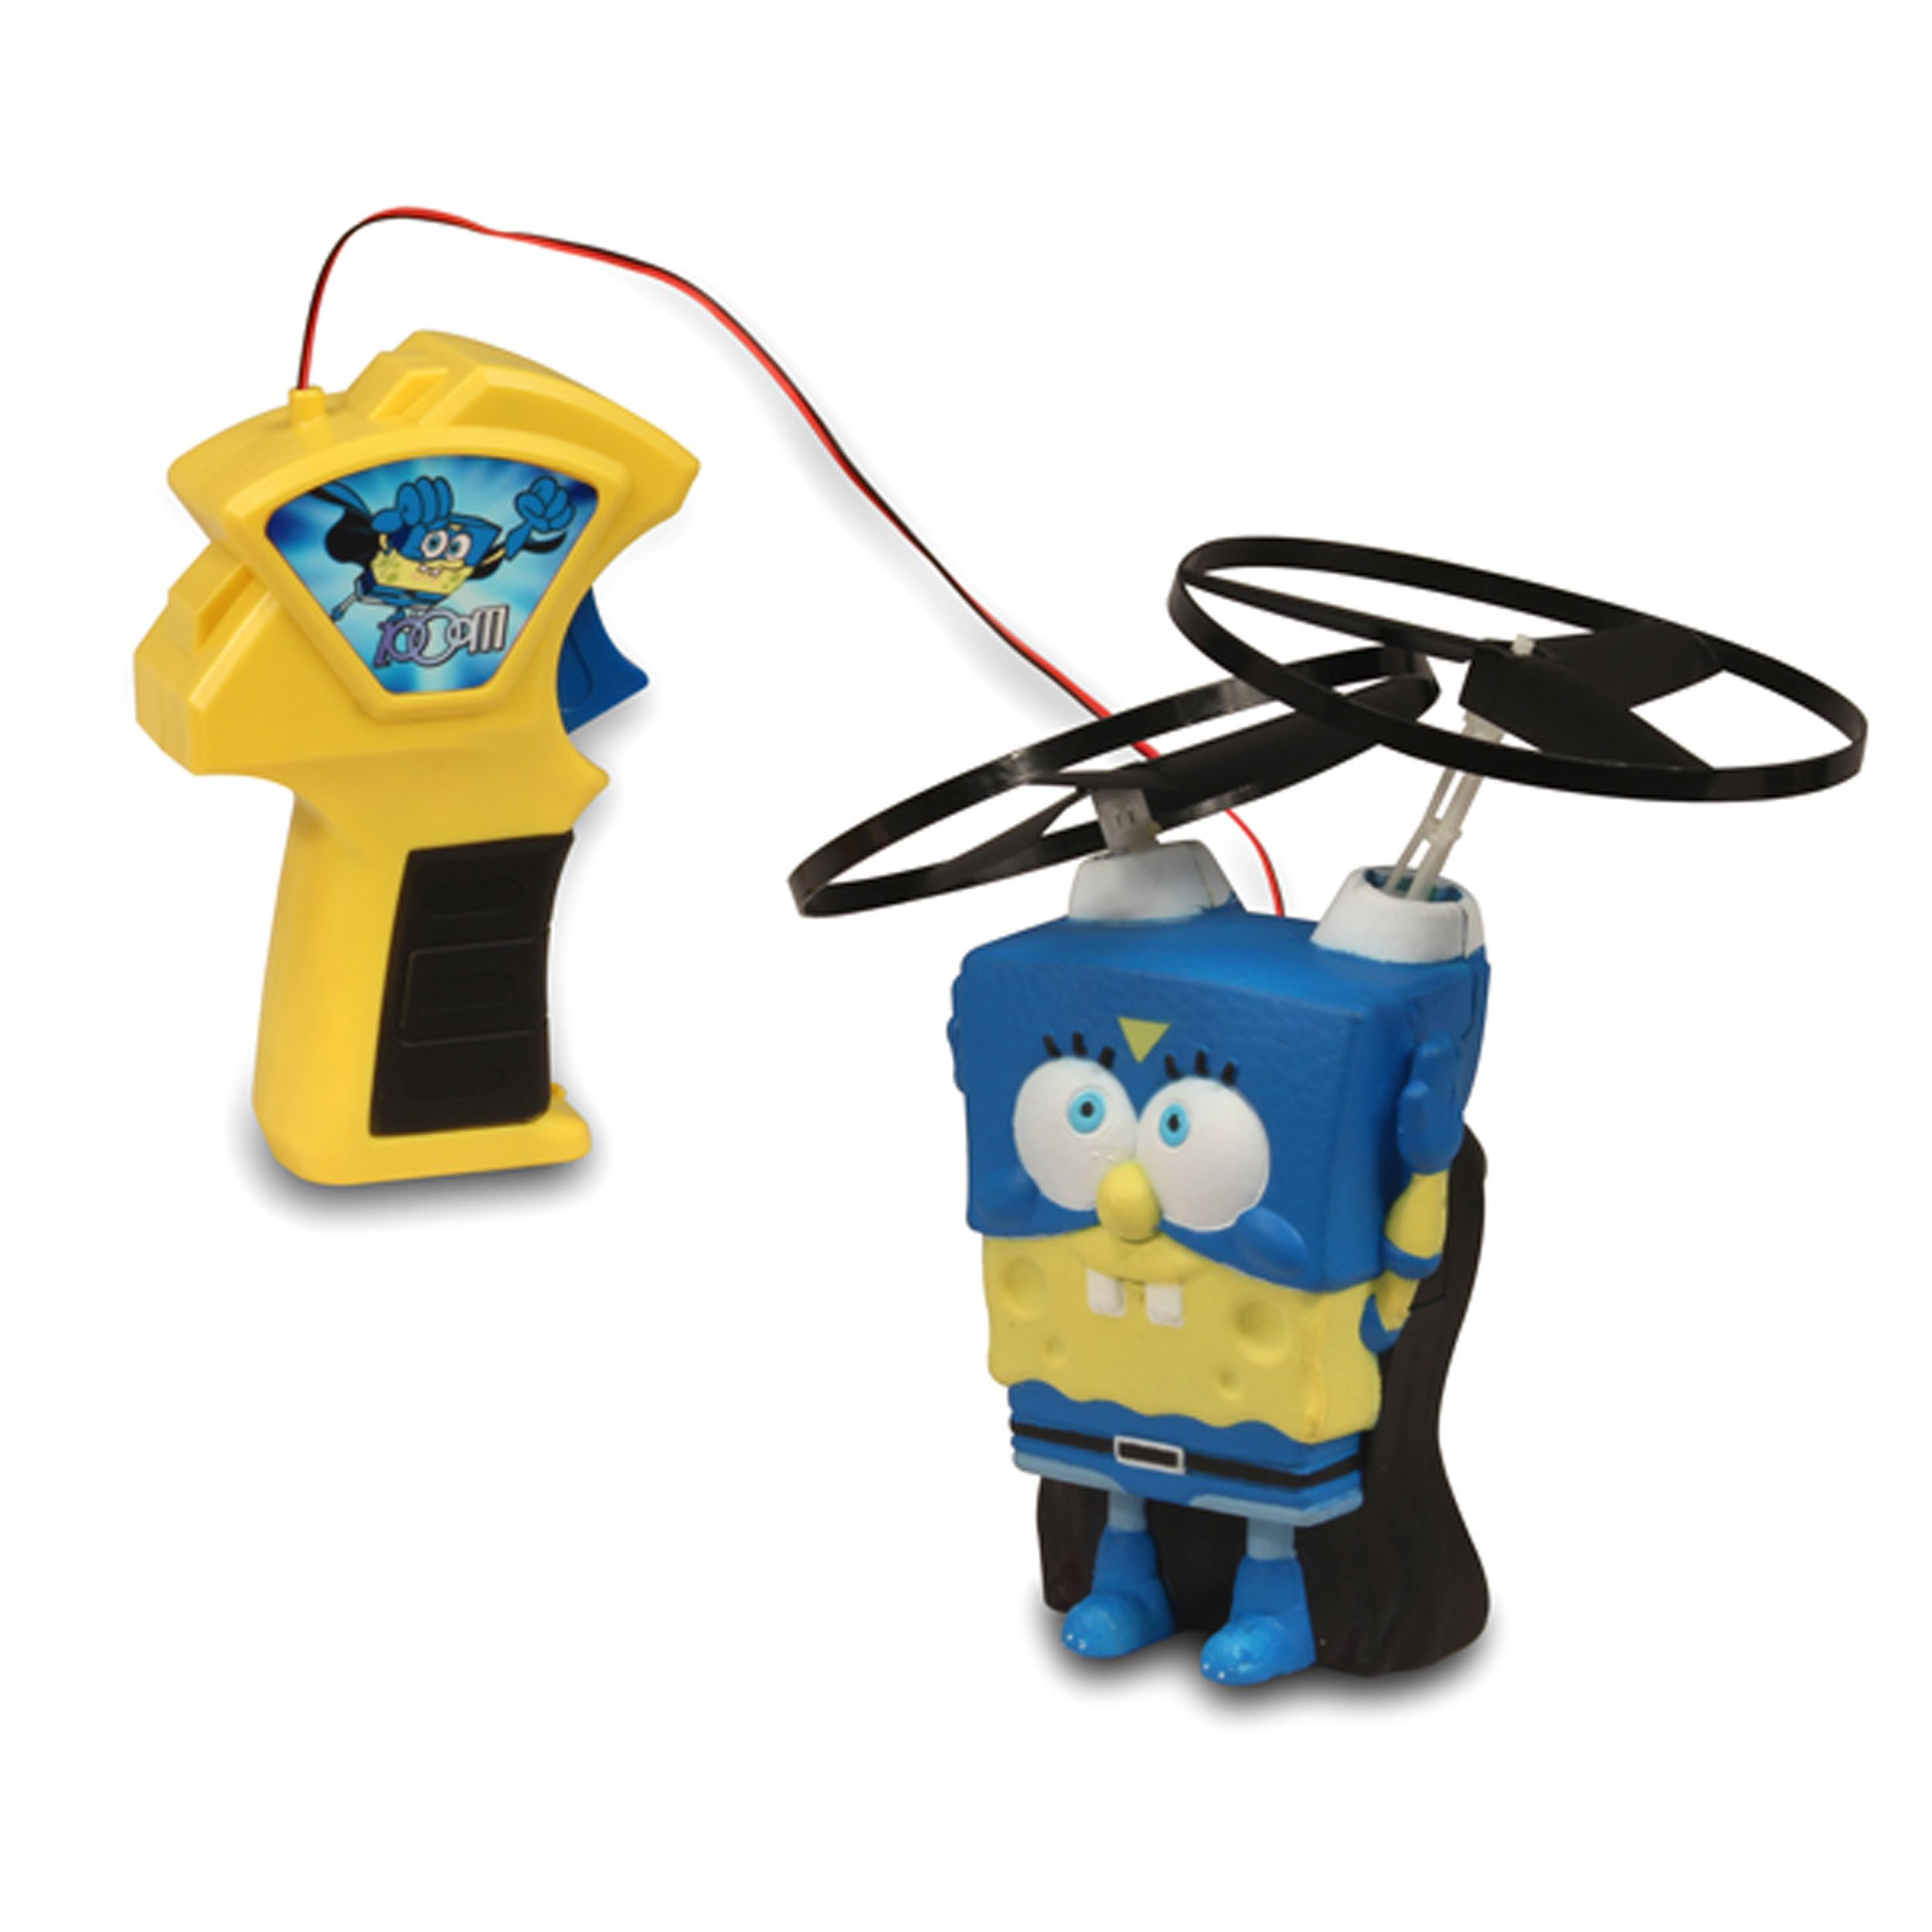 Nkok SpongeBob Squarepants Flying Superhero Products